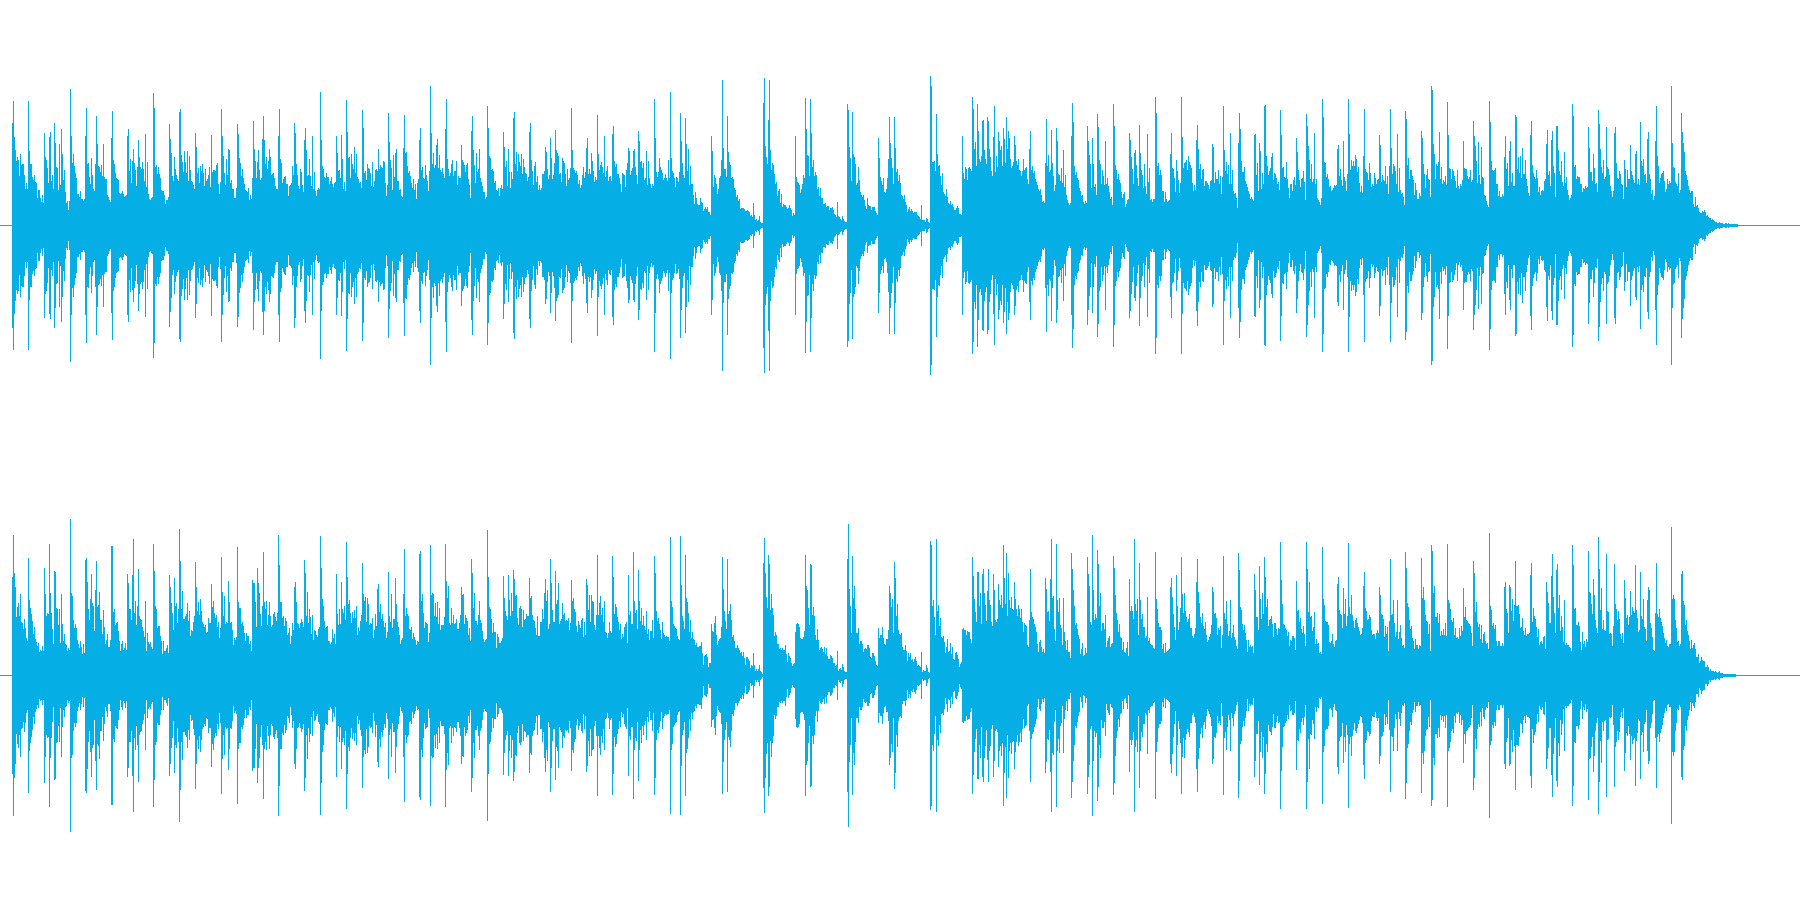 【Samurai Battle】和楽器の再生済みの波形